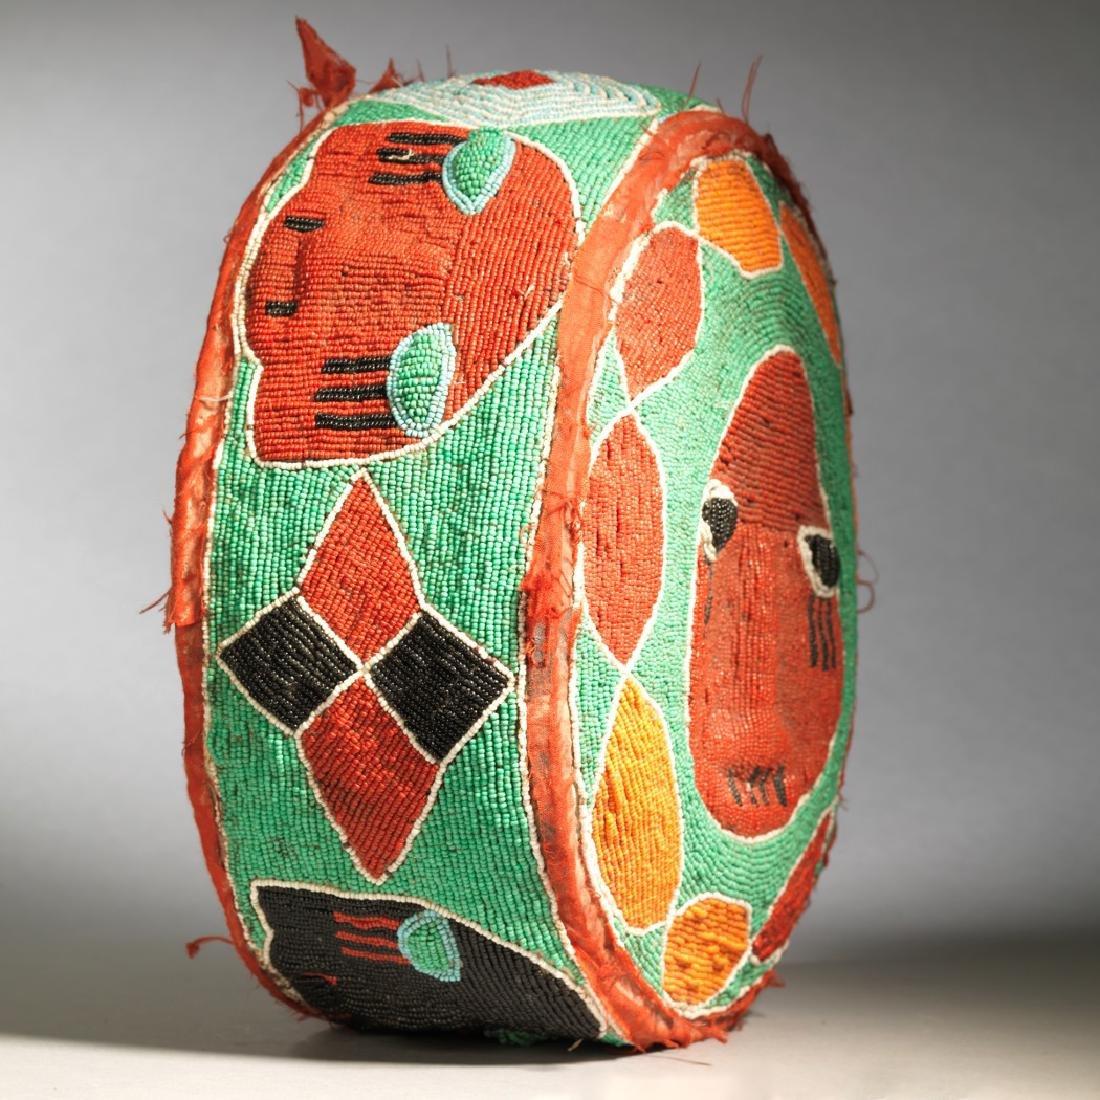 Yoruba Royal Foot Cushion Tribal Art - 2